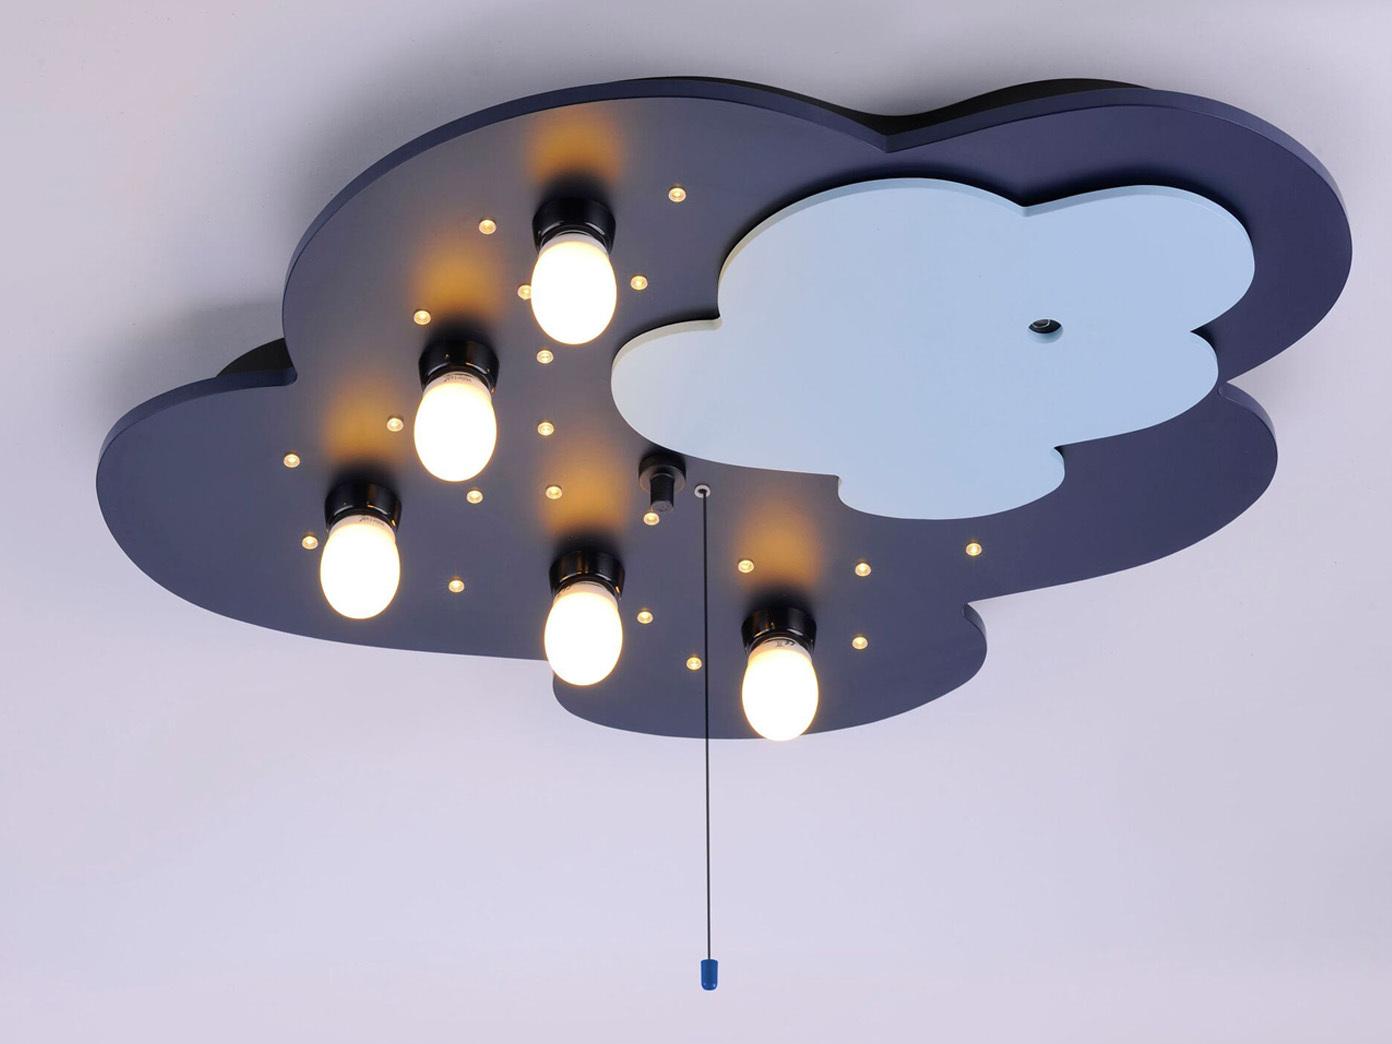 deckenlampe f r kinderzimmer neu an smartphone koppelbar led schlummerlicht ebay. Black Bedroom Furniture Sets. Home Design Ideas